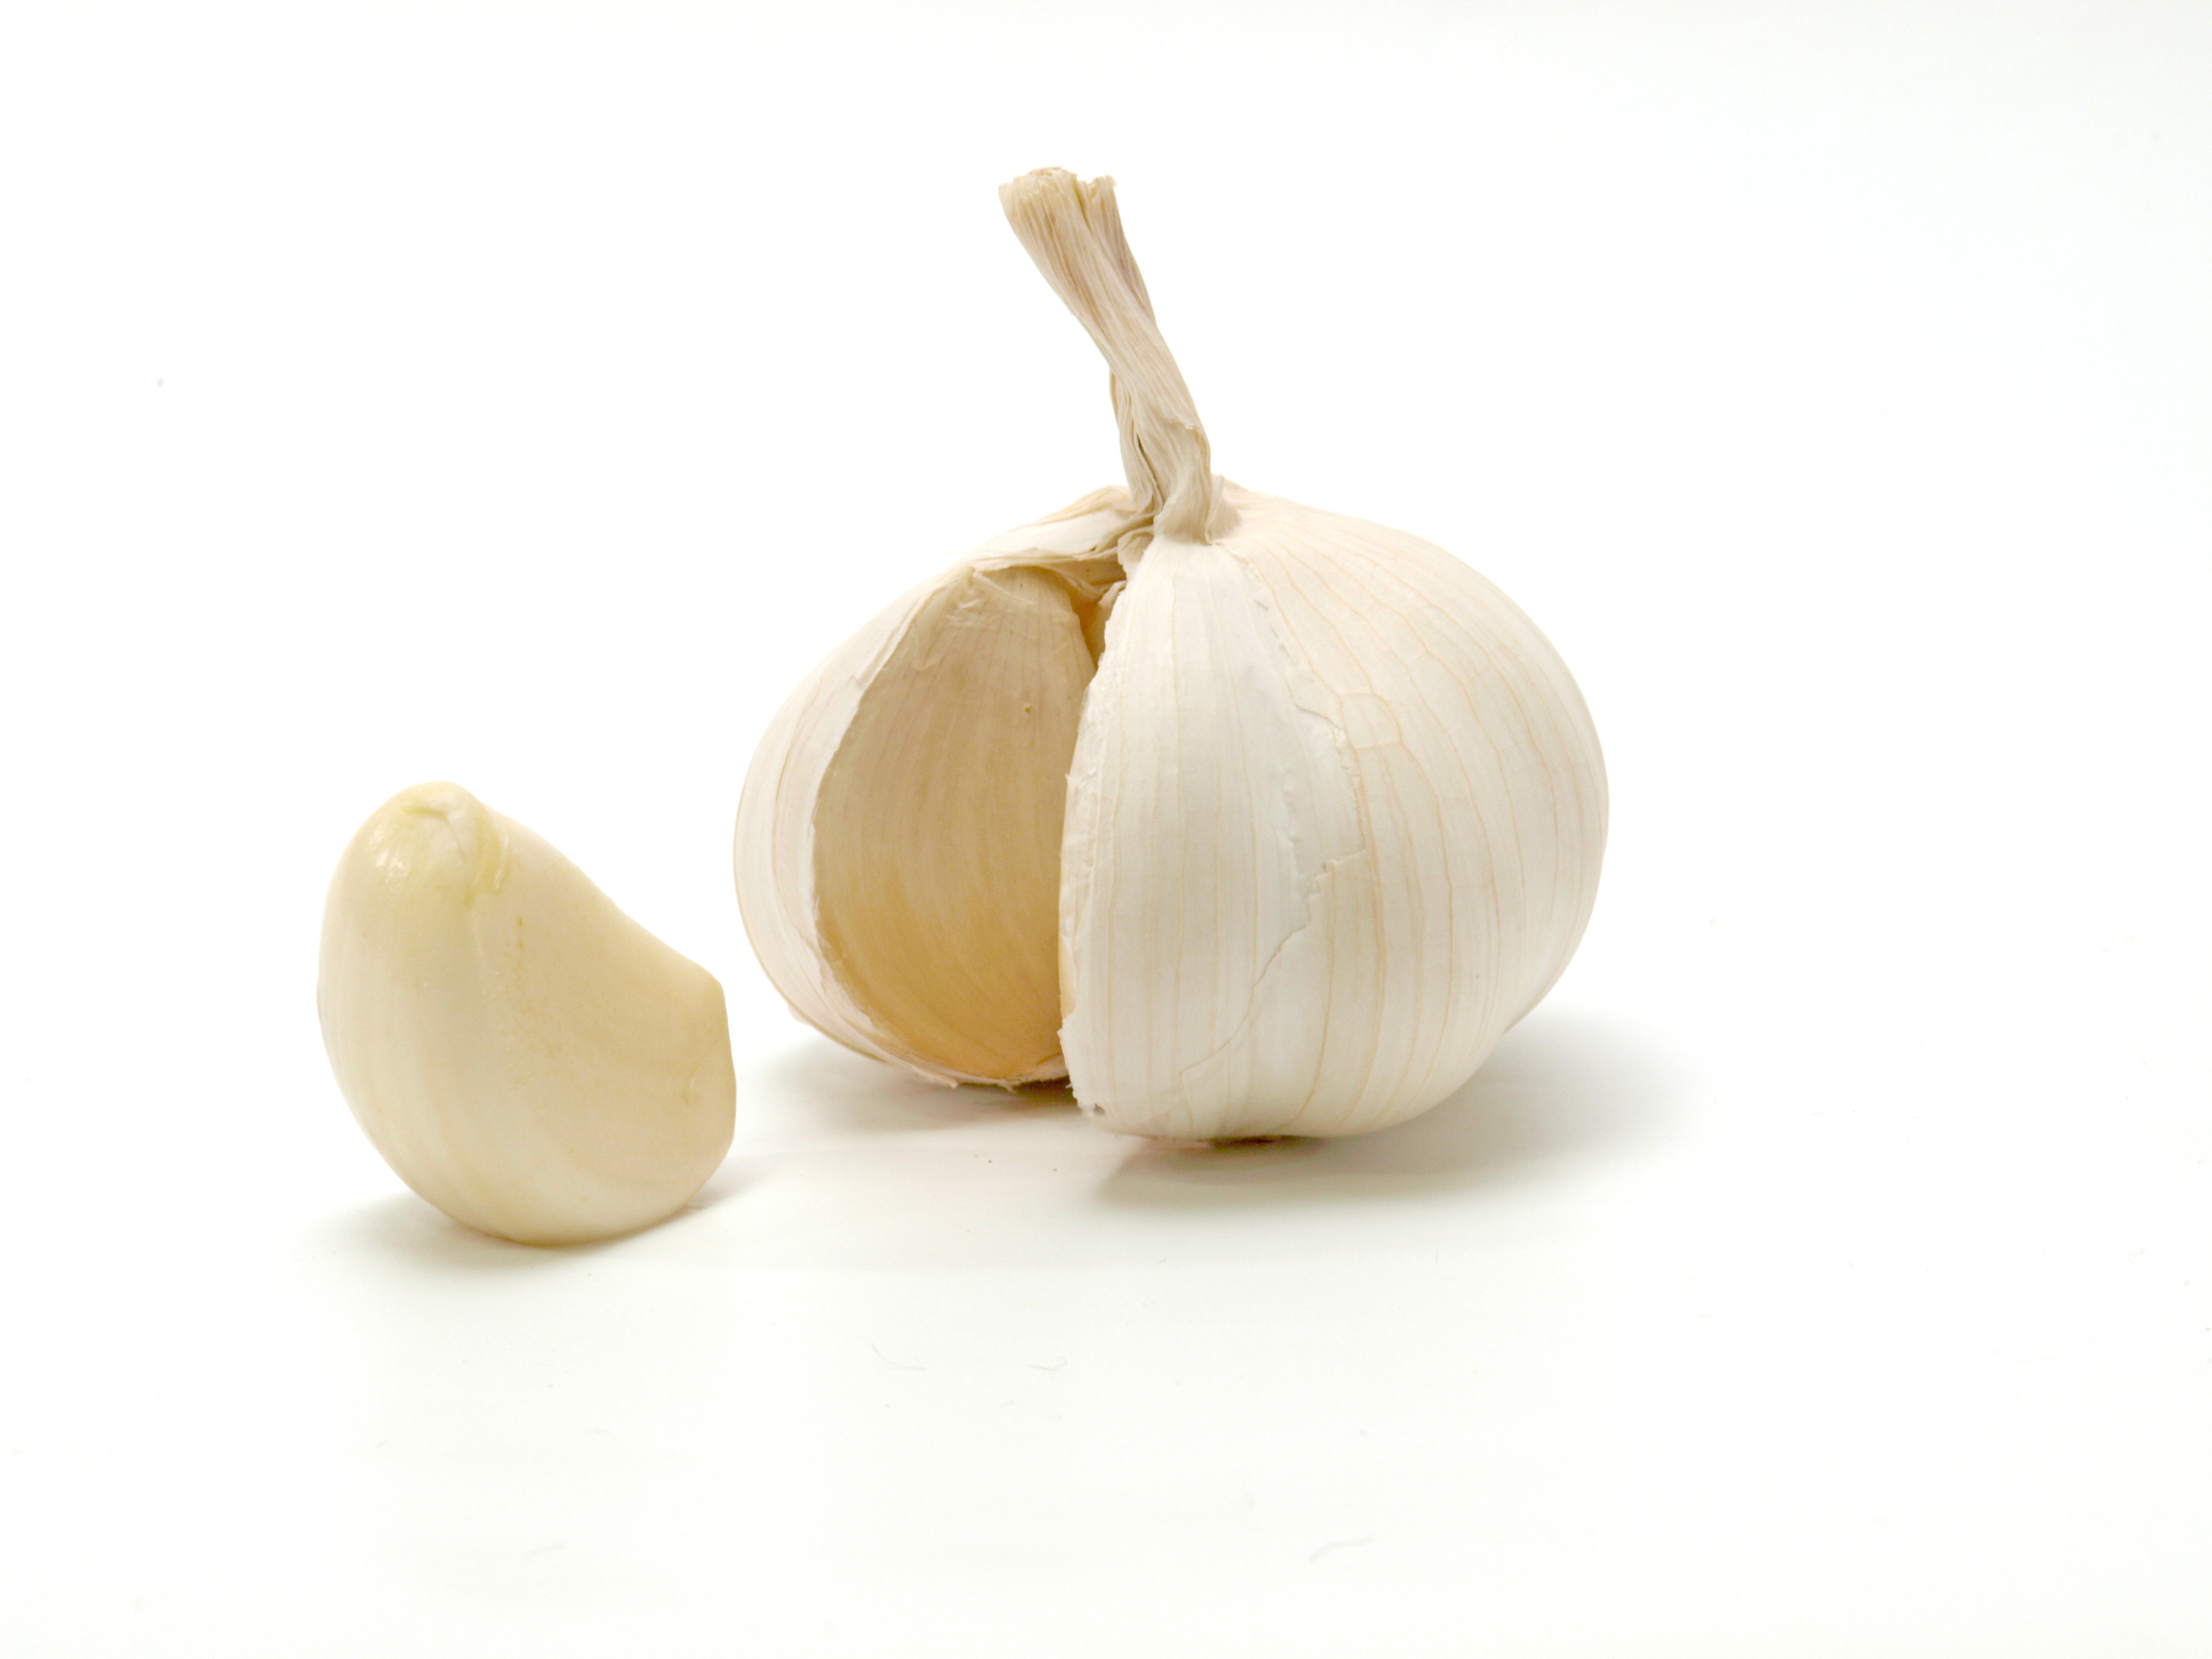 How to Peel a Garlic Clove